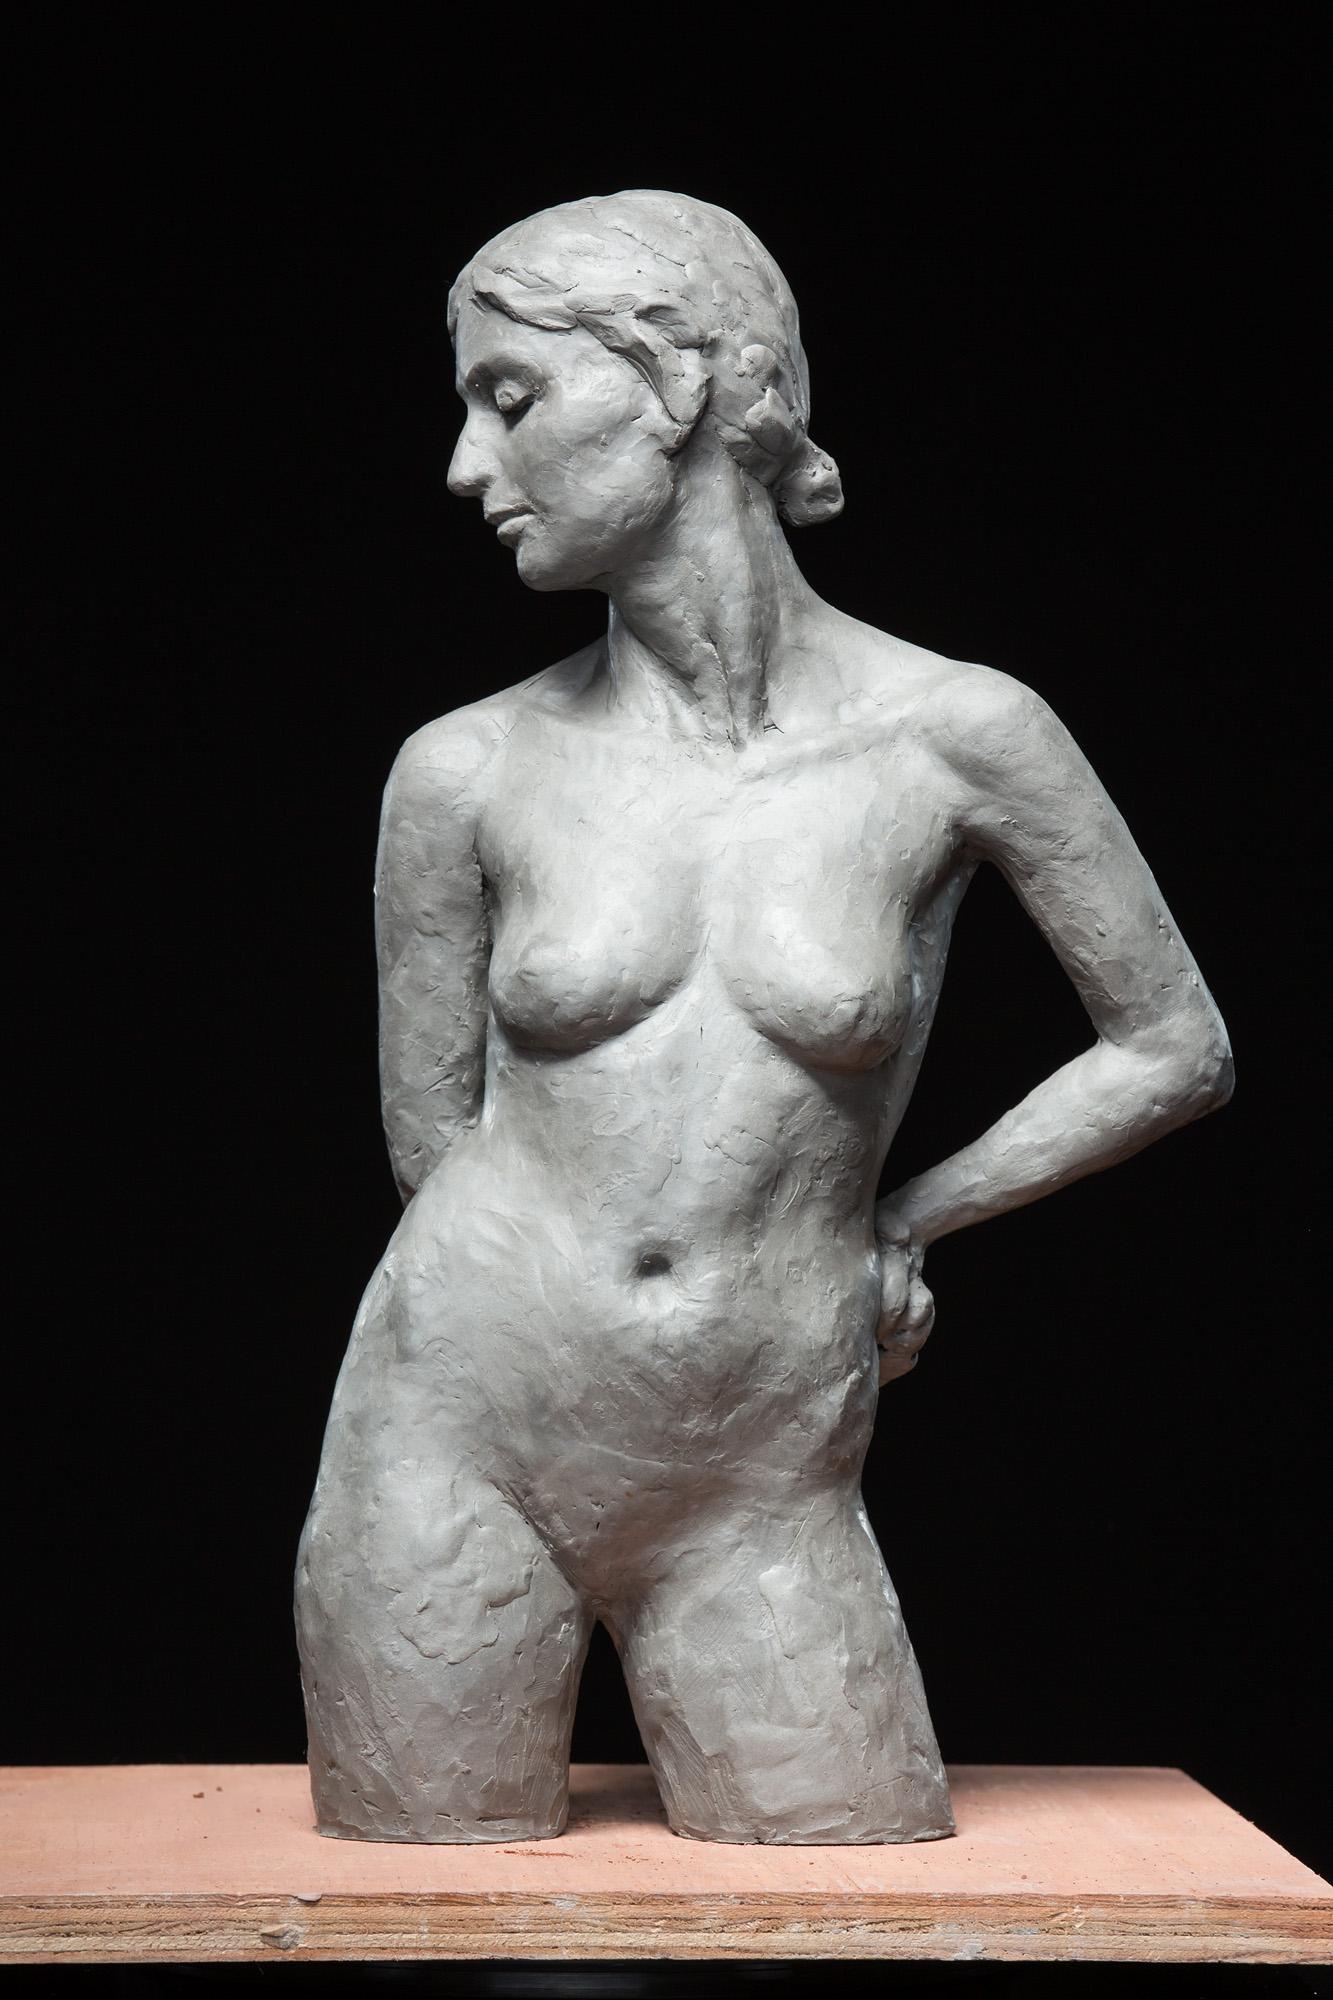 Figure Sculpture in Clay